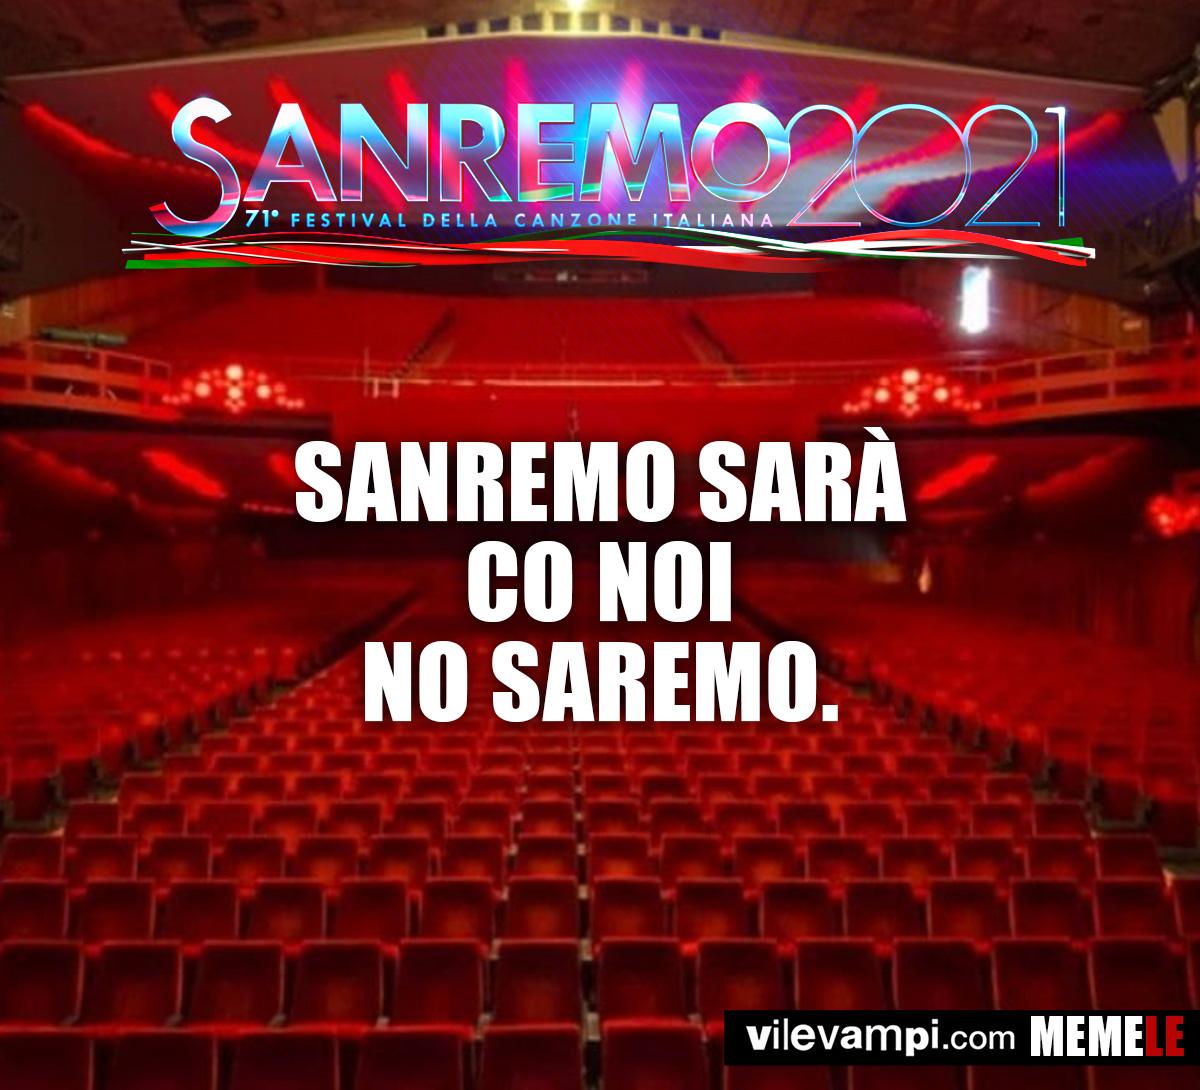 2021_Meme_Sanremo